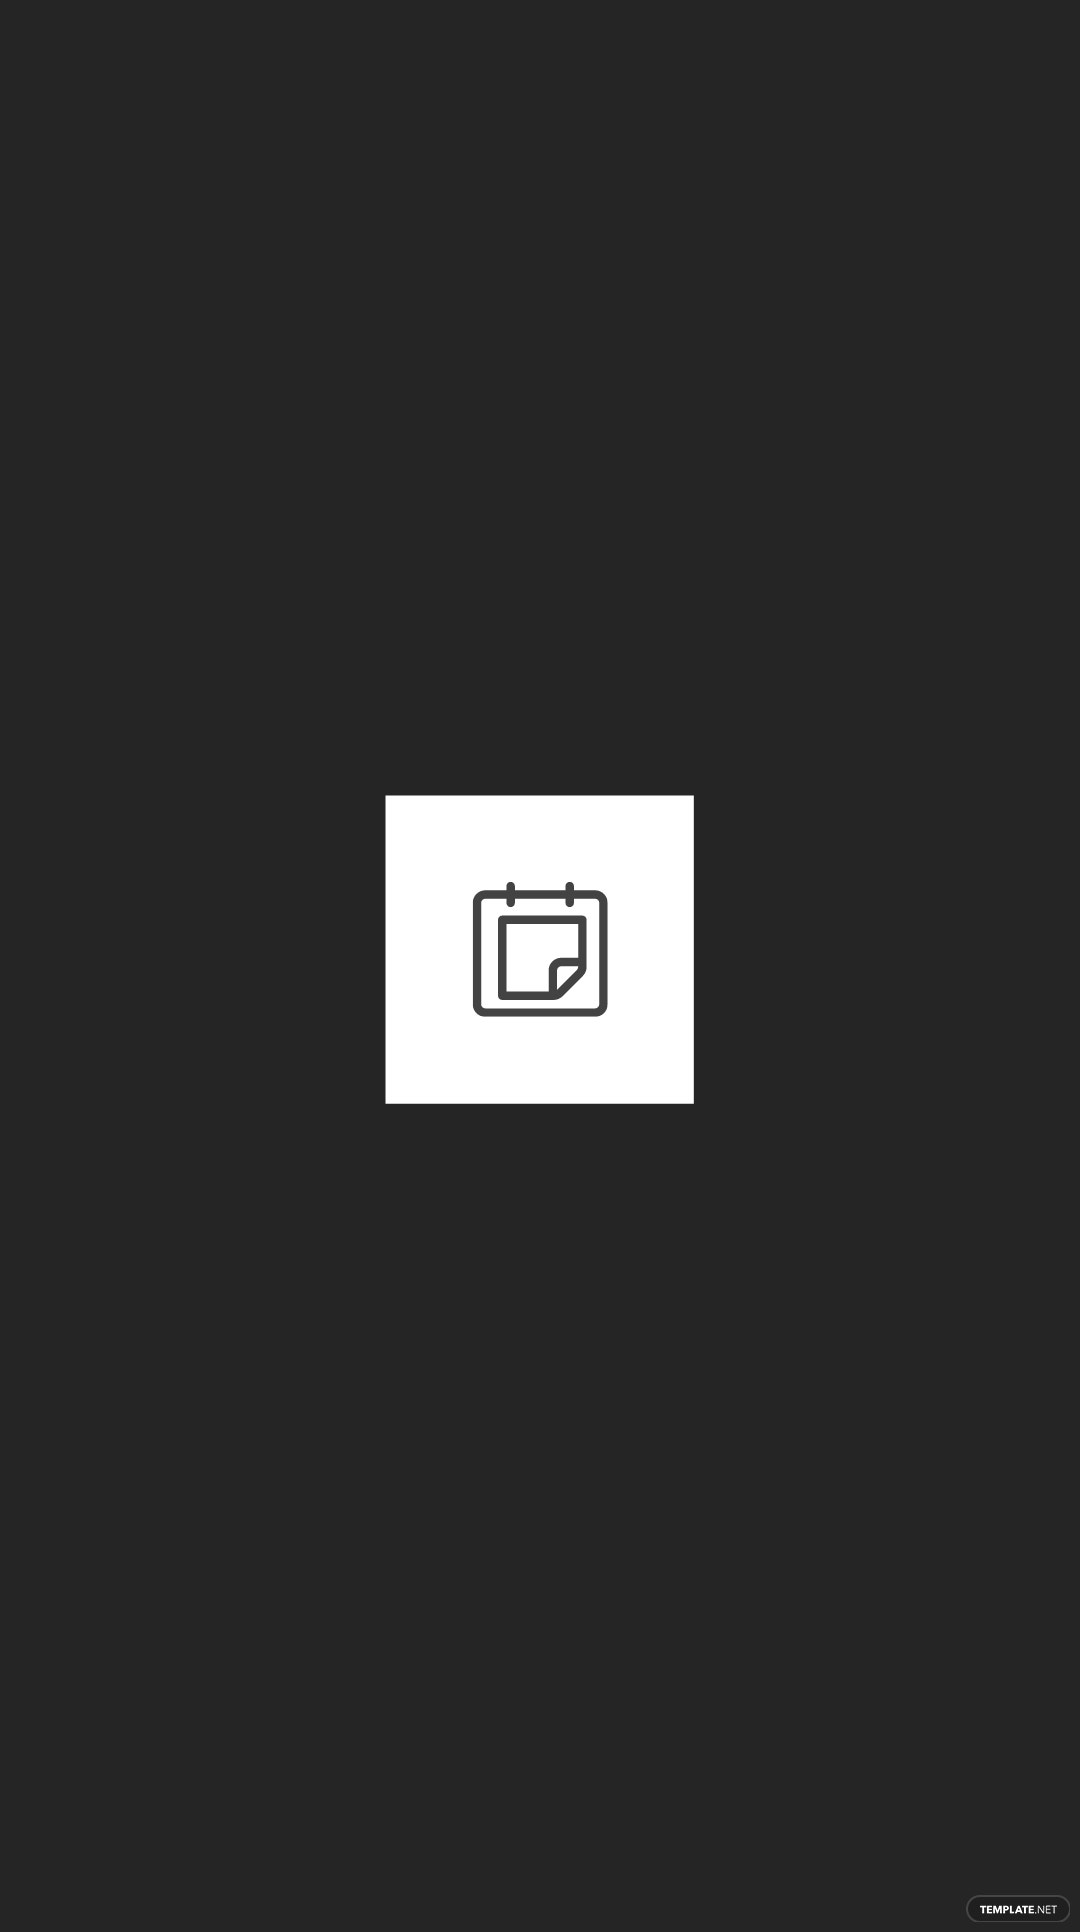 Black and White Instagram Story Highlight Cover 4.jpe